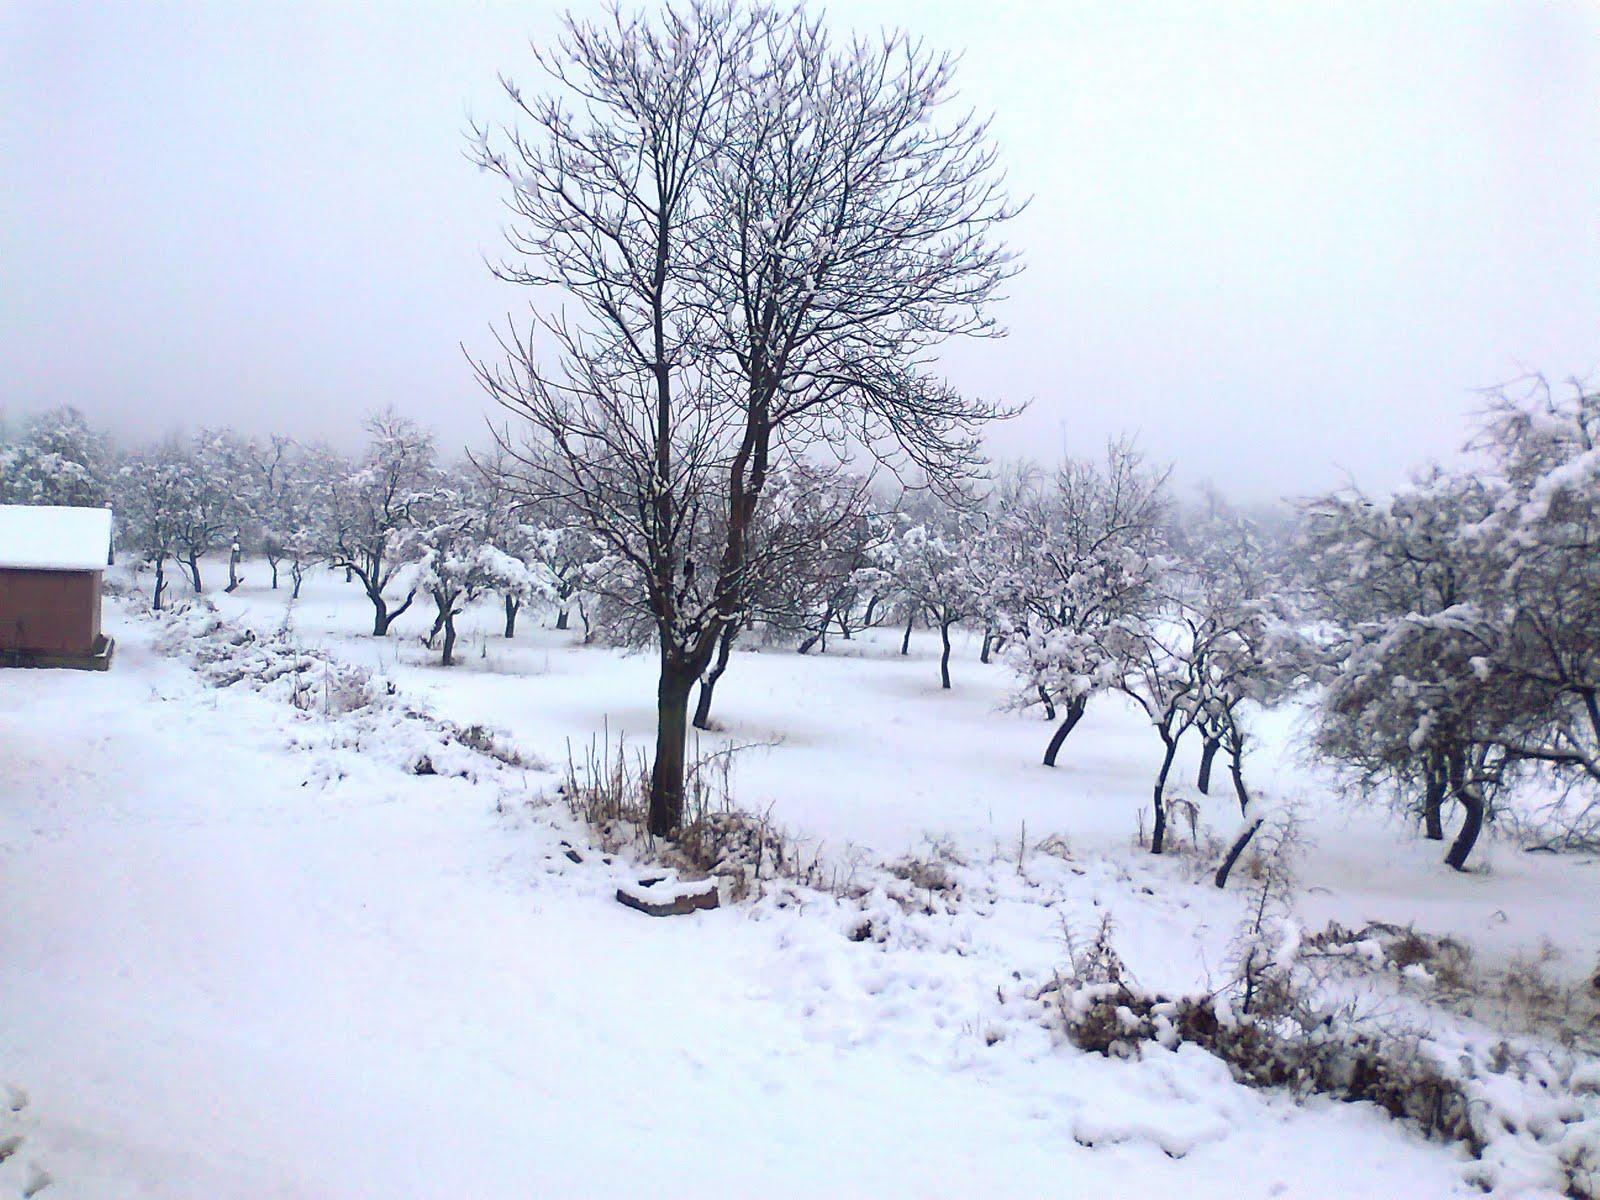 snowfallinkashmirbringsdownmercury